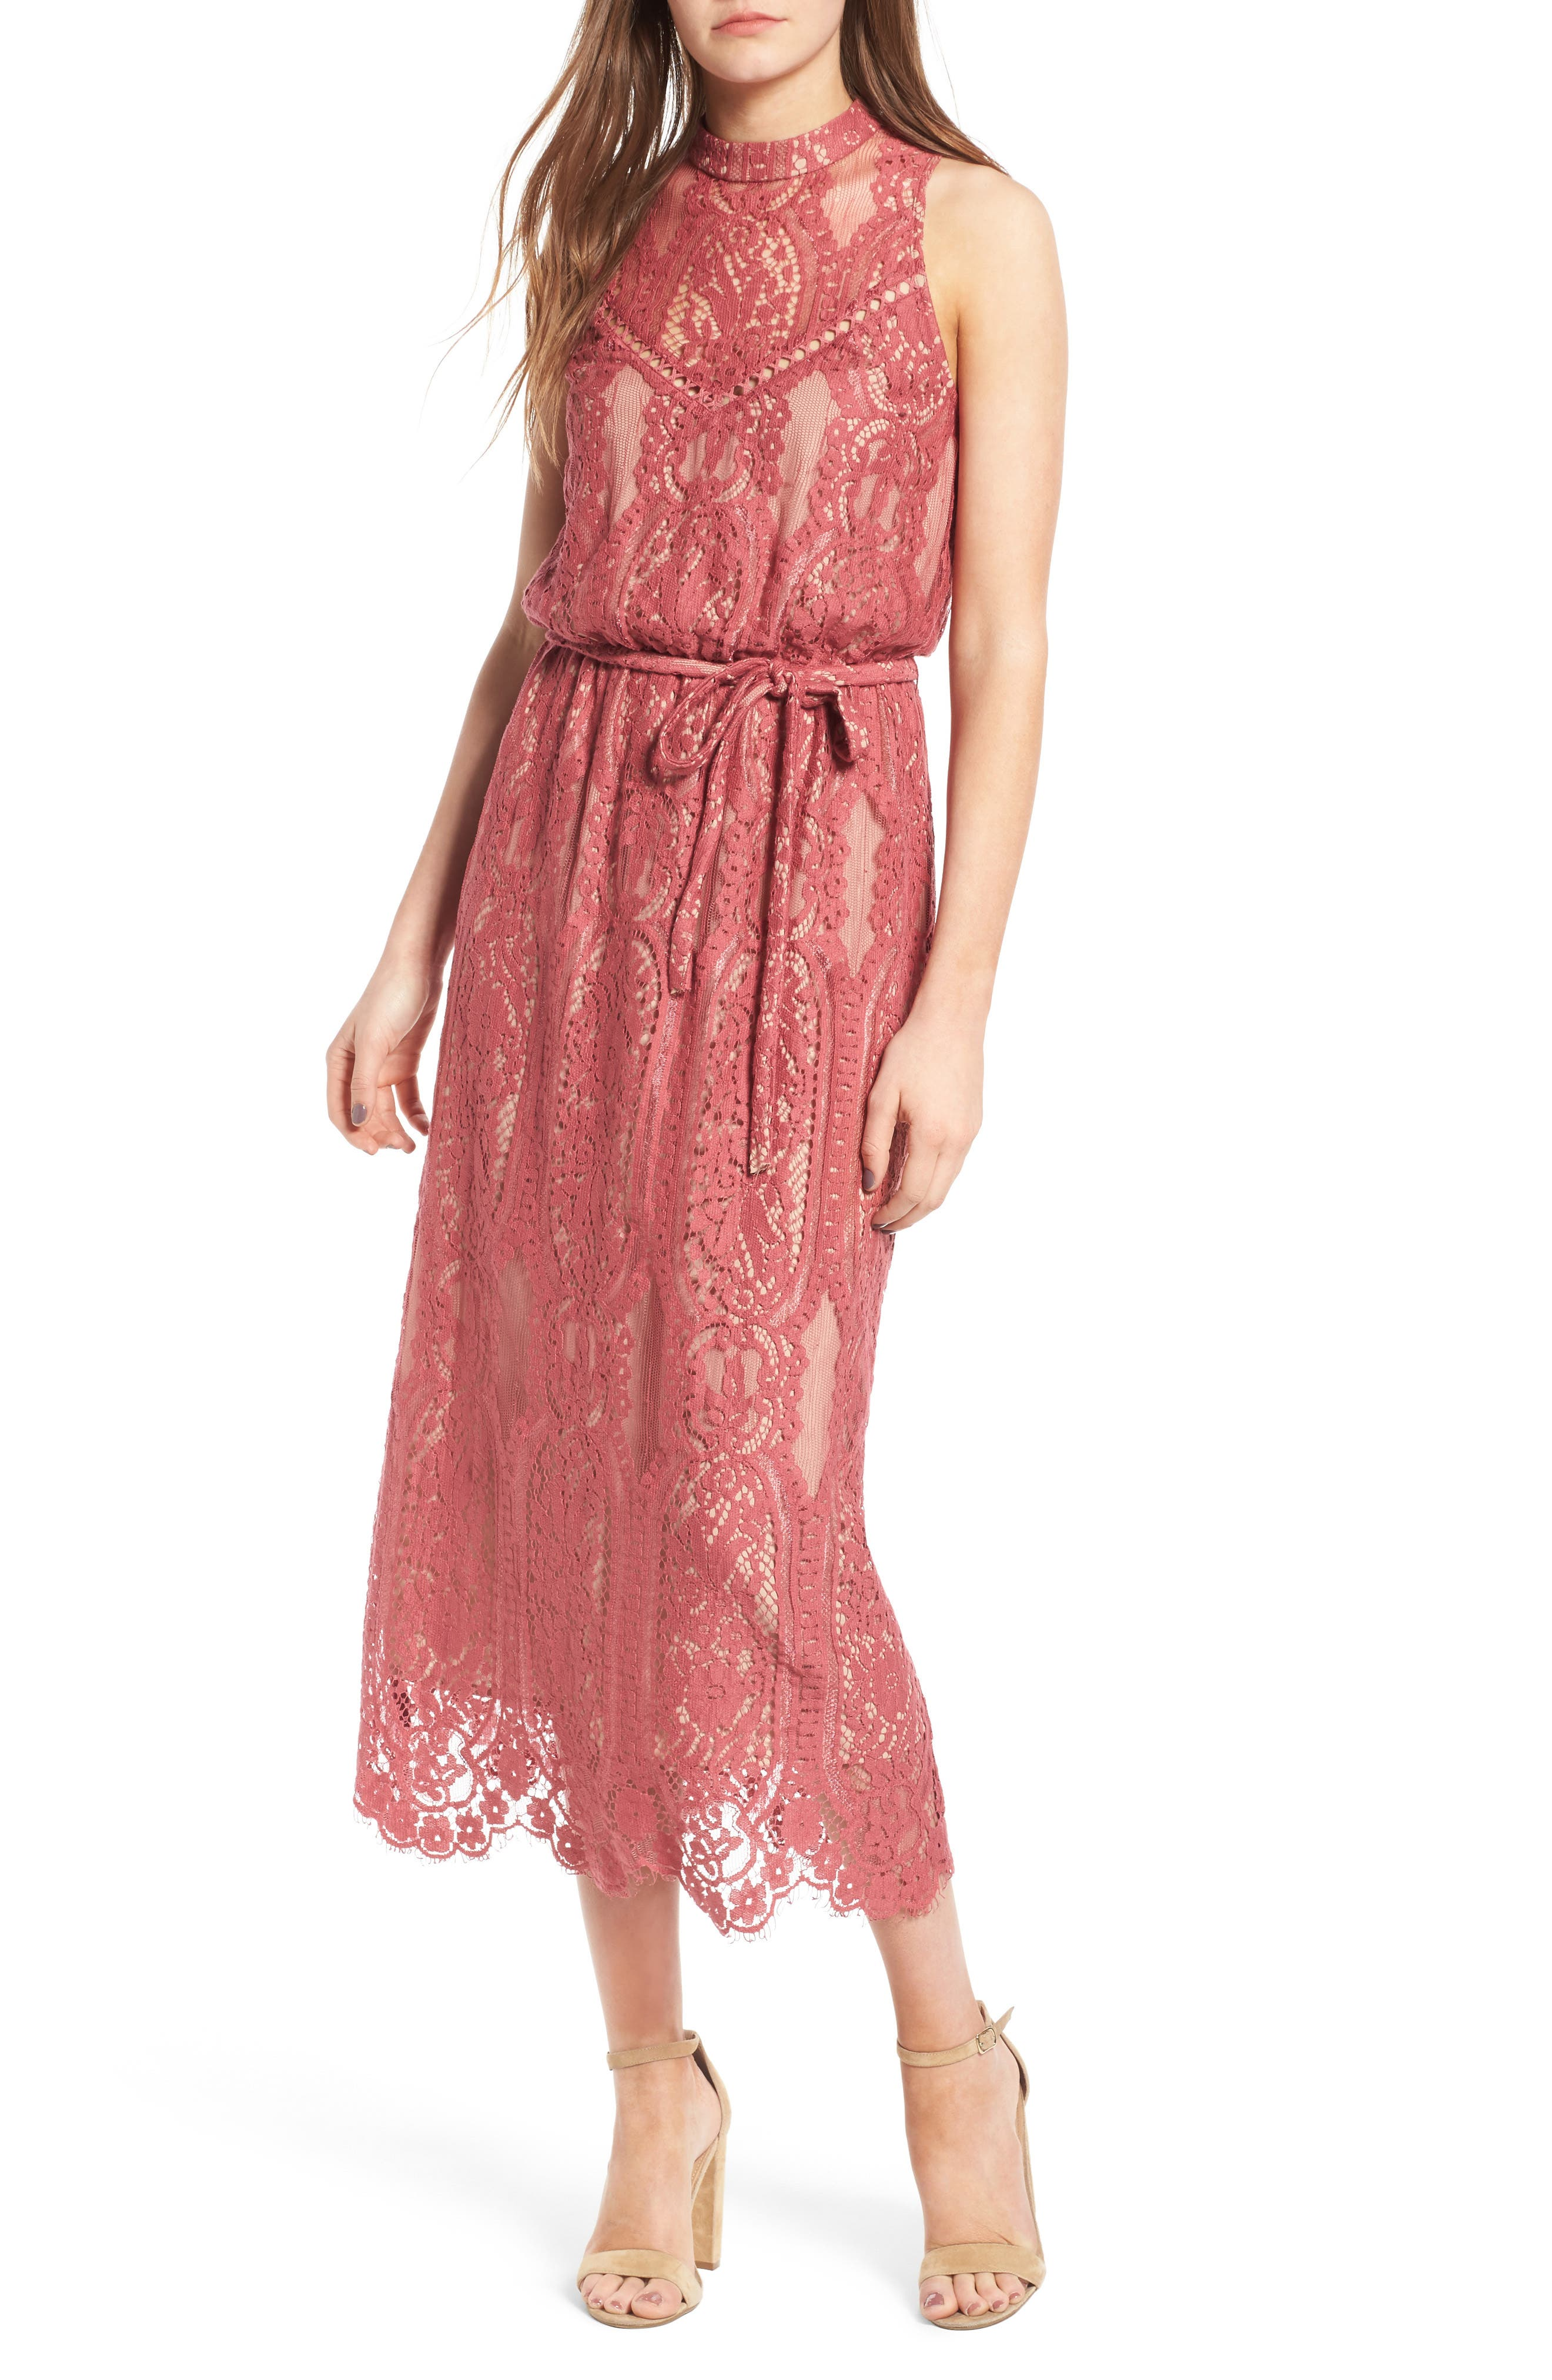 Alternate Image 1 Selected - WAYF 'Portrait' Lace Midi Dress